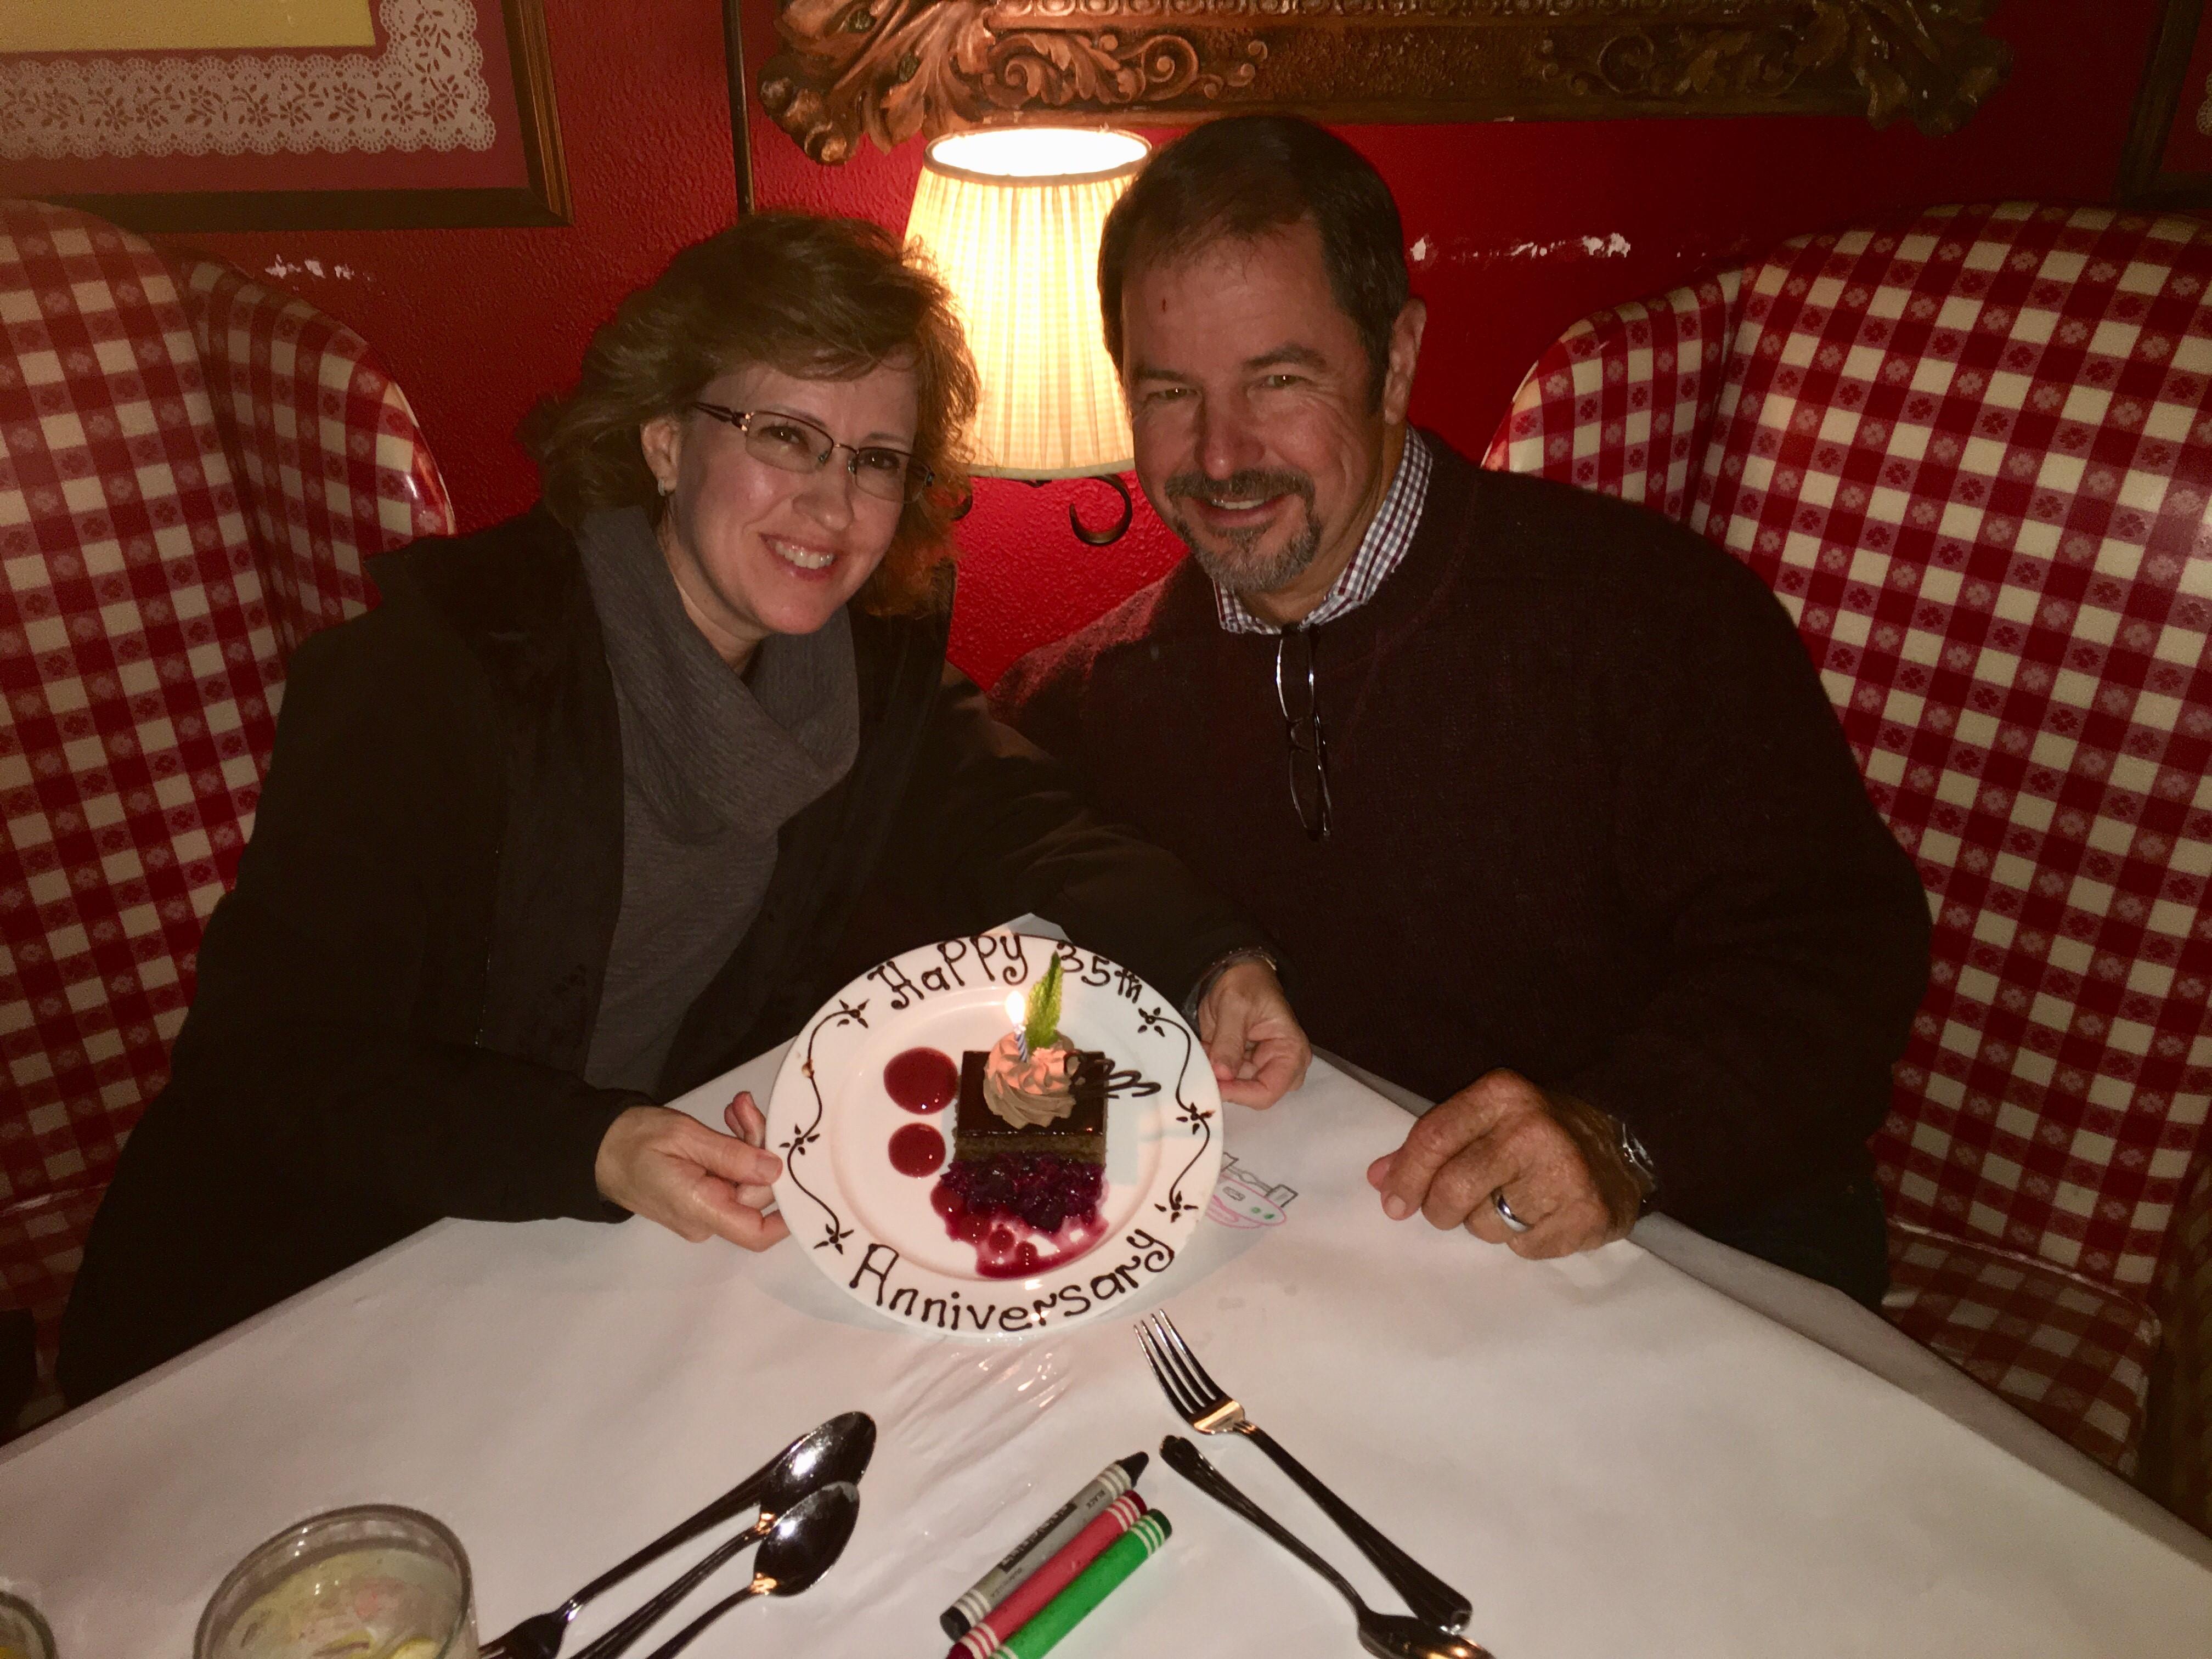 Kim and her husband, Karl, celebrating their 35th anniversary.